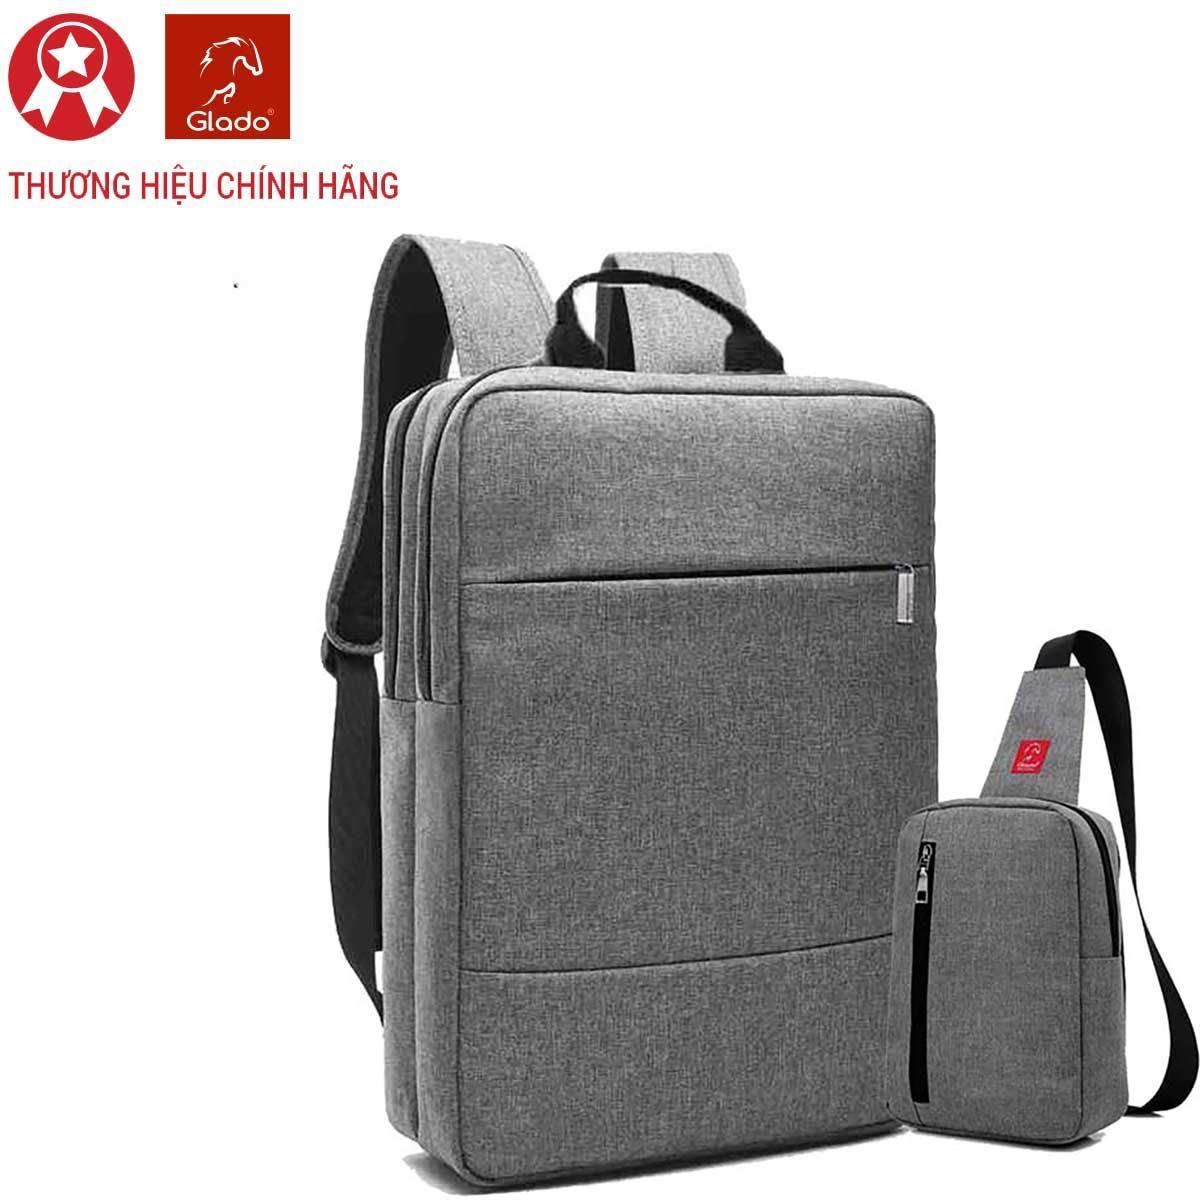 Bán Balo Laptop Thời Trang Nam Zapas Blc010 Tặng Túi Messenger Glado Dcg026Gr Vietnam Rẻ